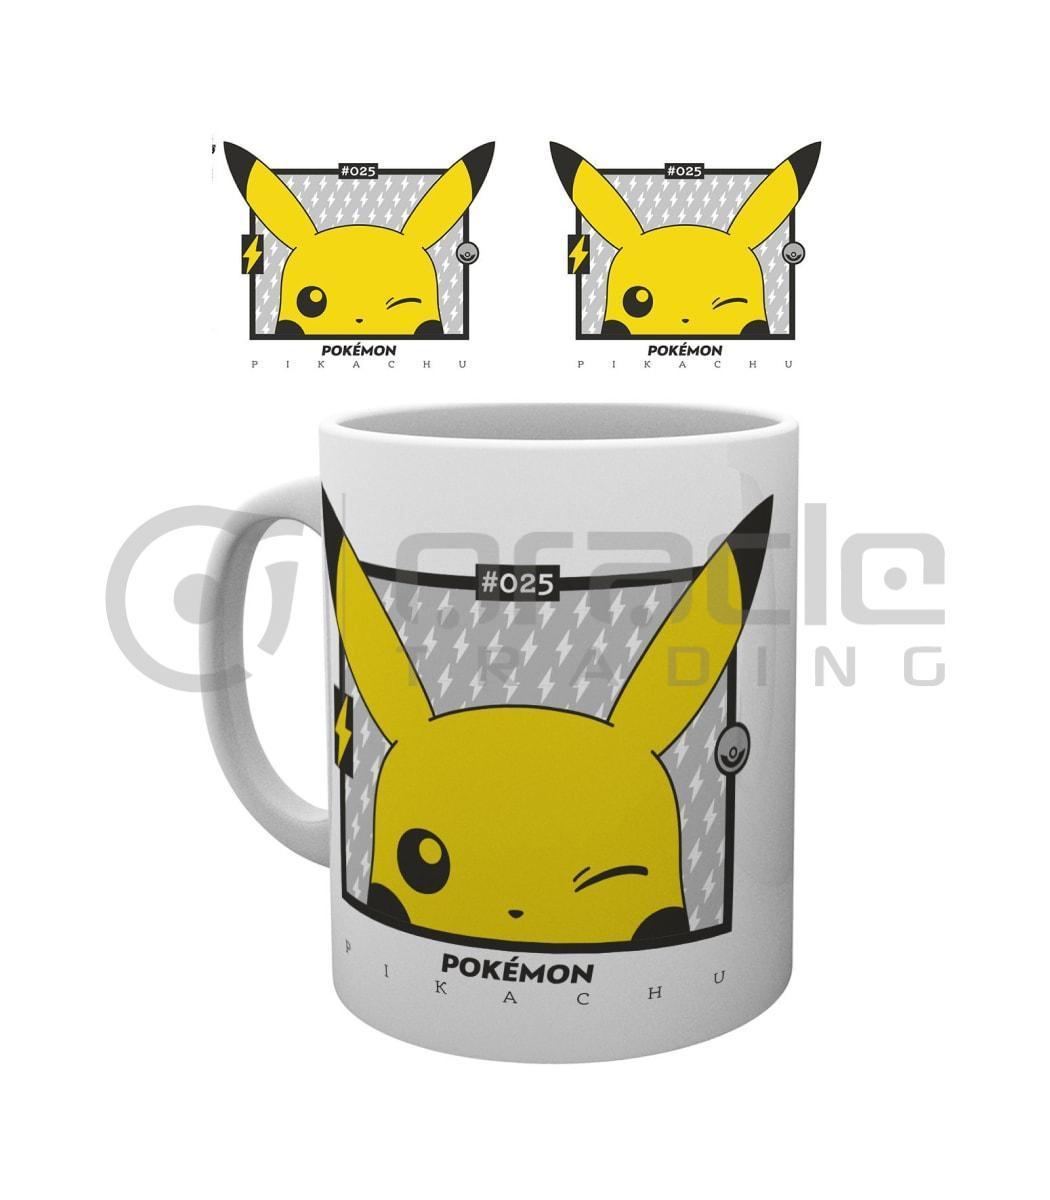 Pokémon Mug - Pikachu Wink